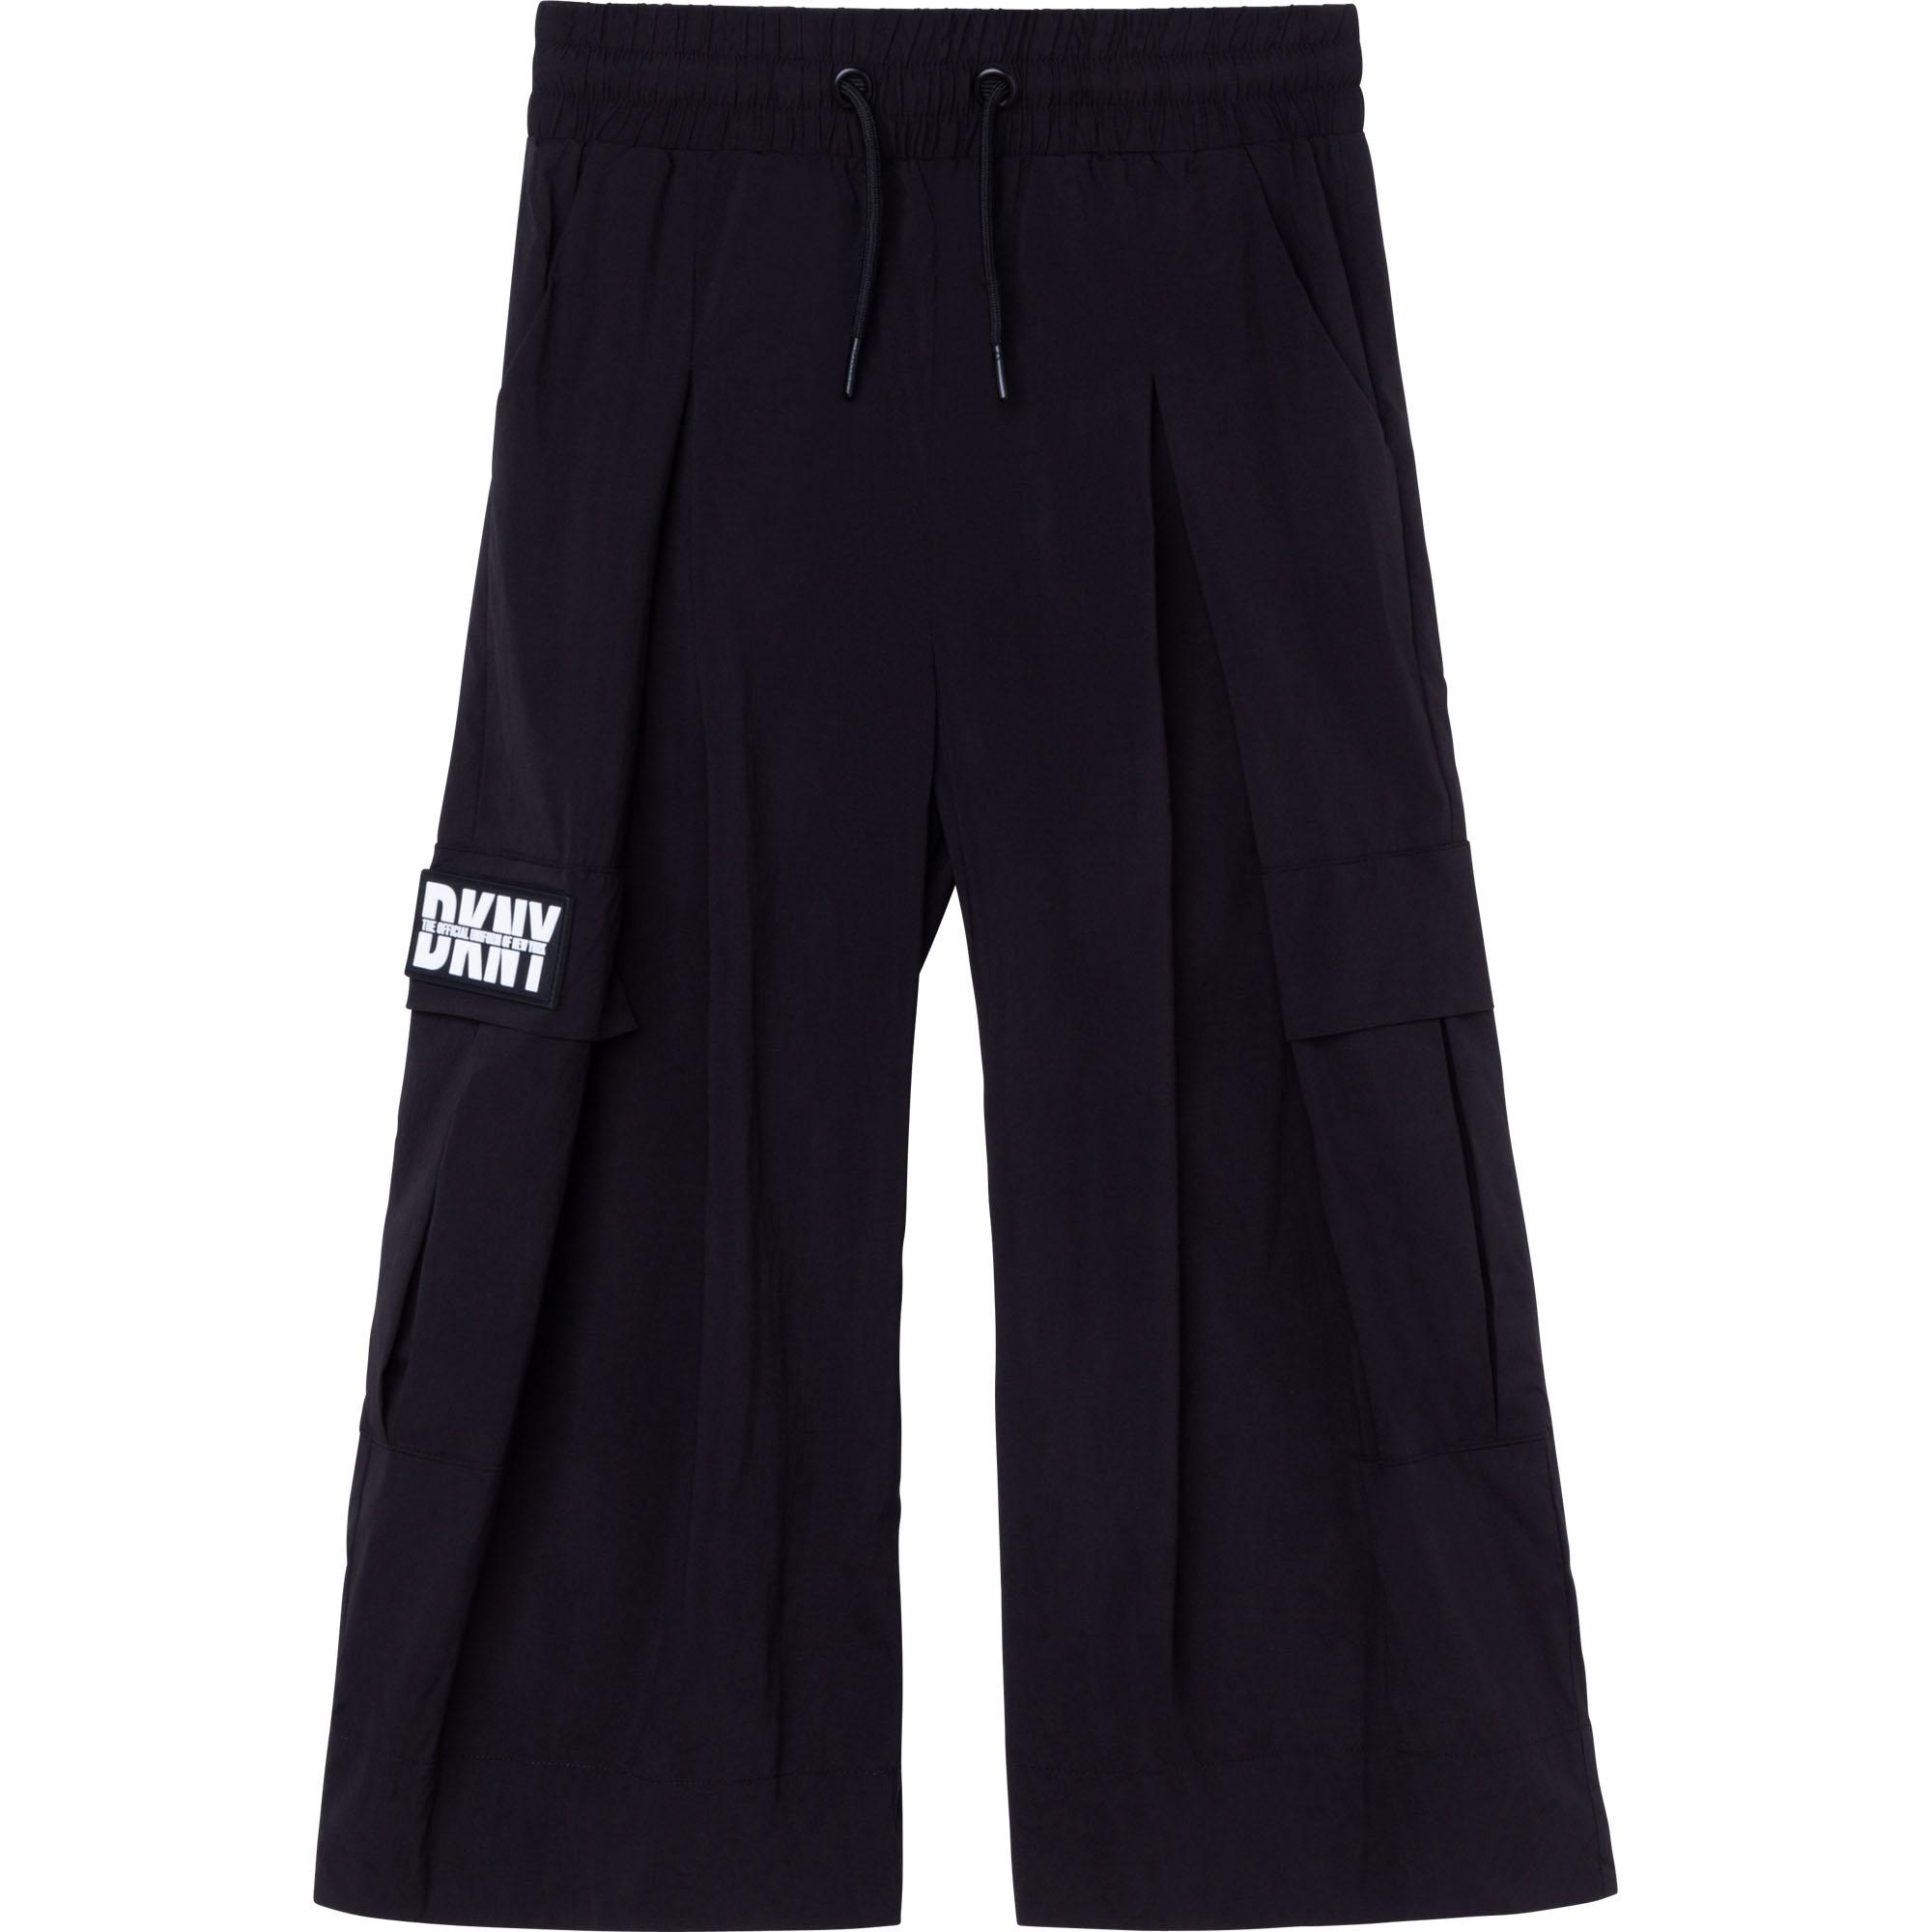 Pantalon large avec badge DKNY pour FILLE